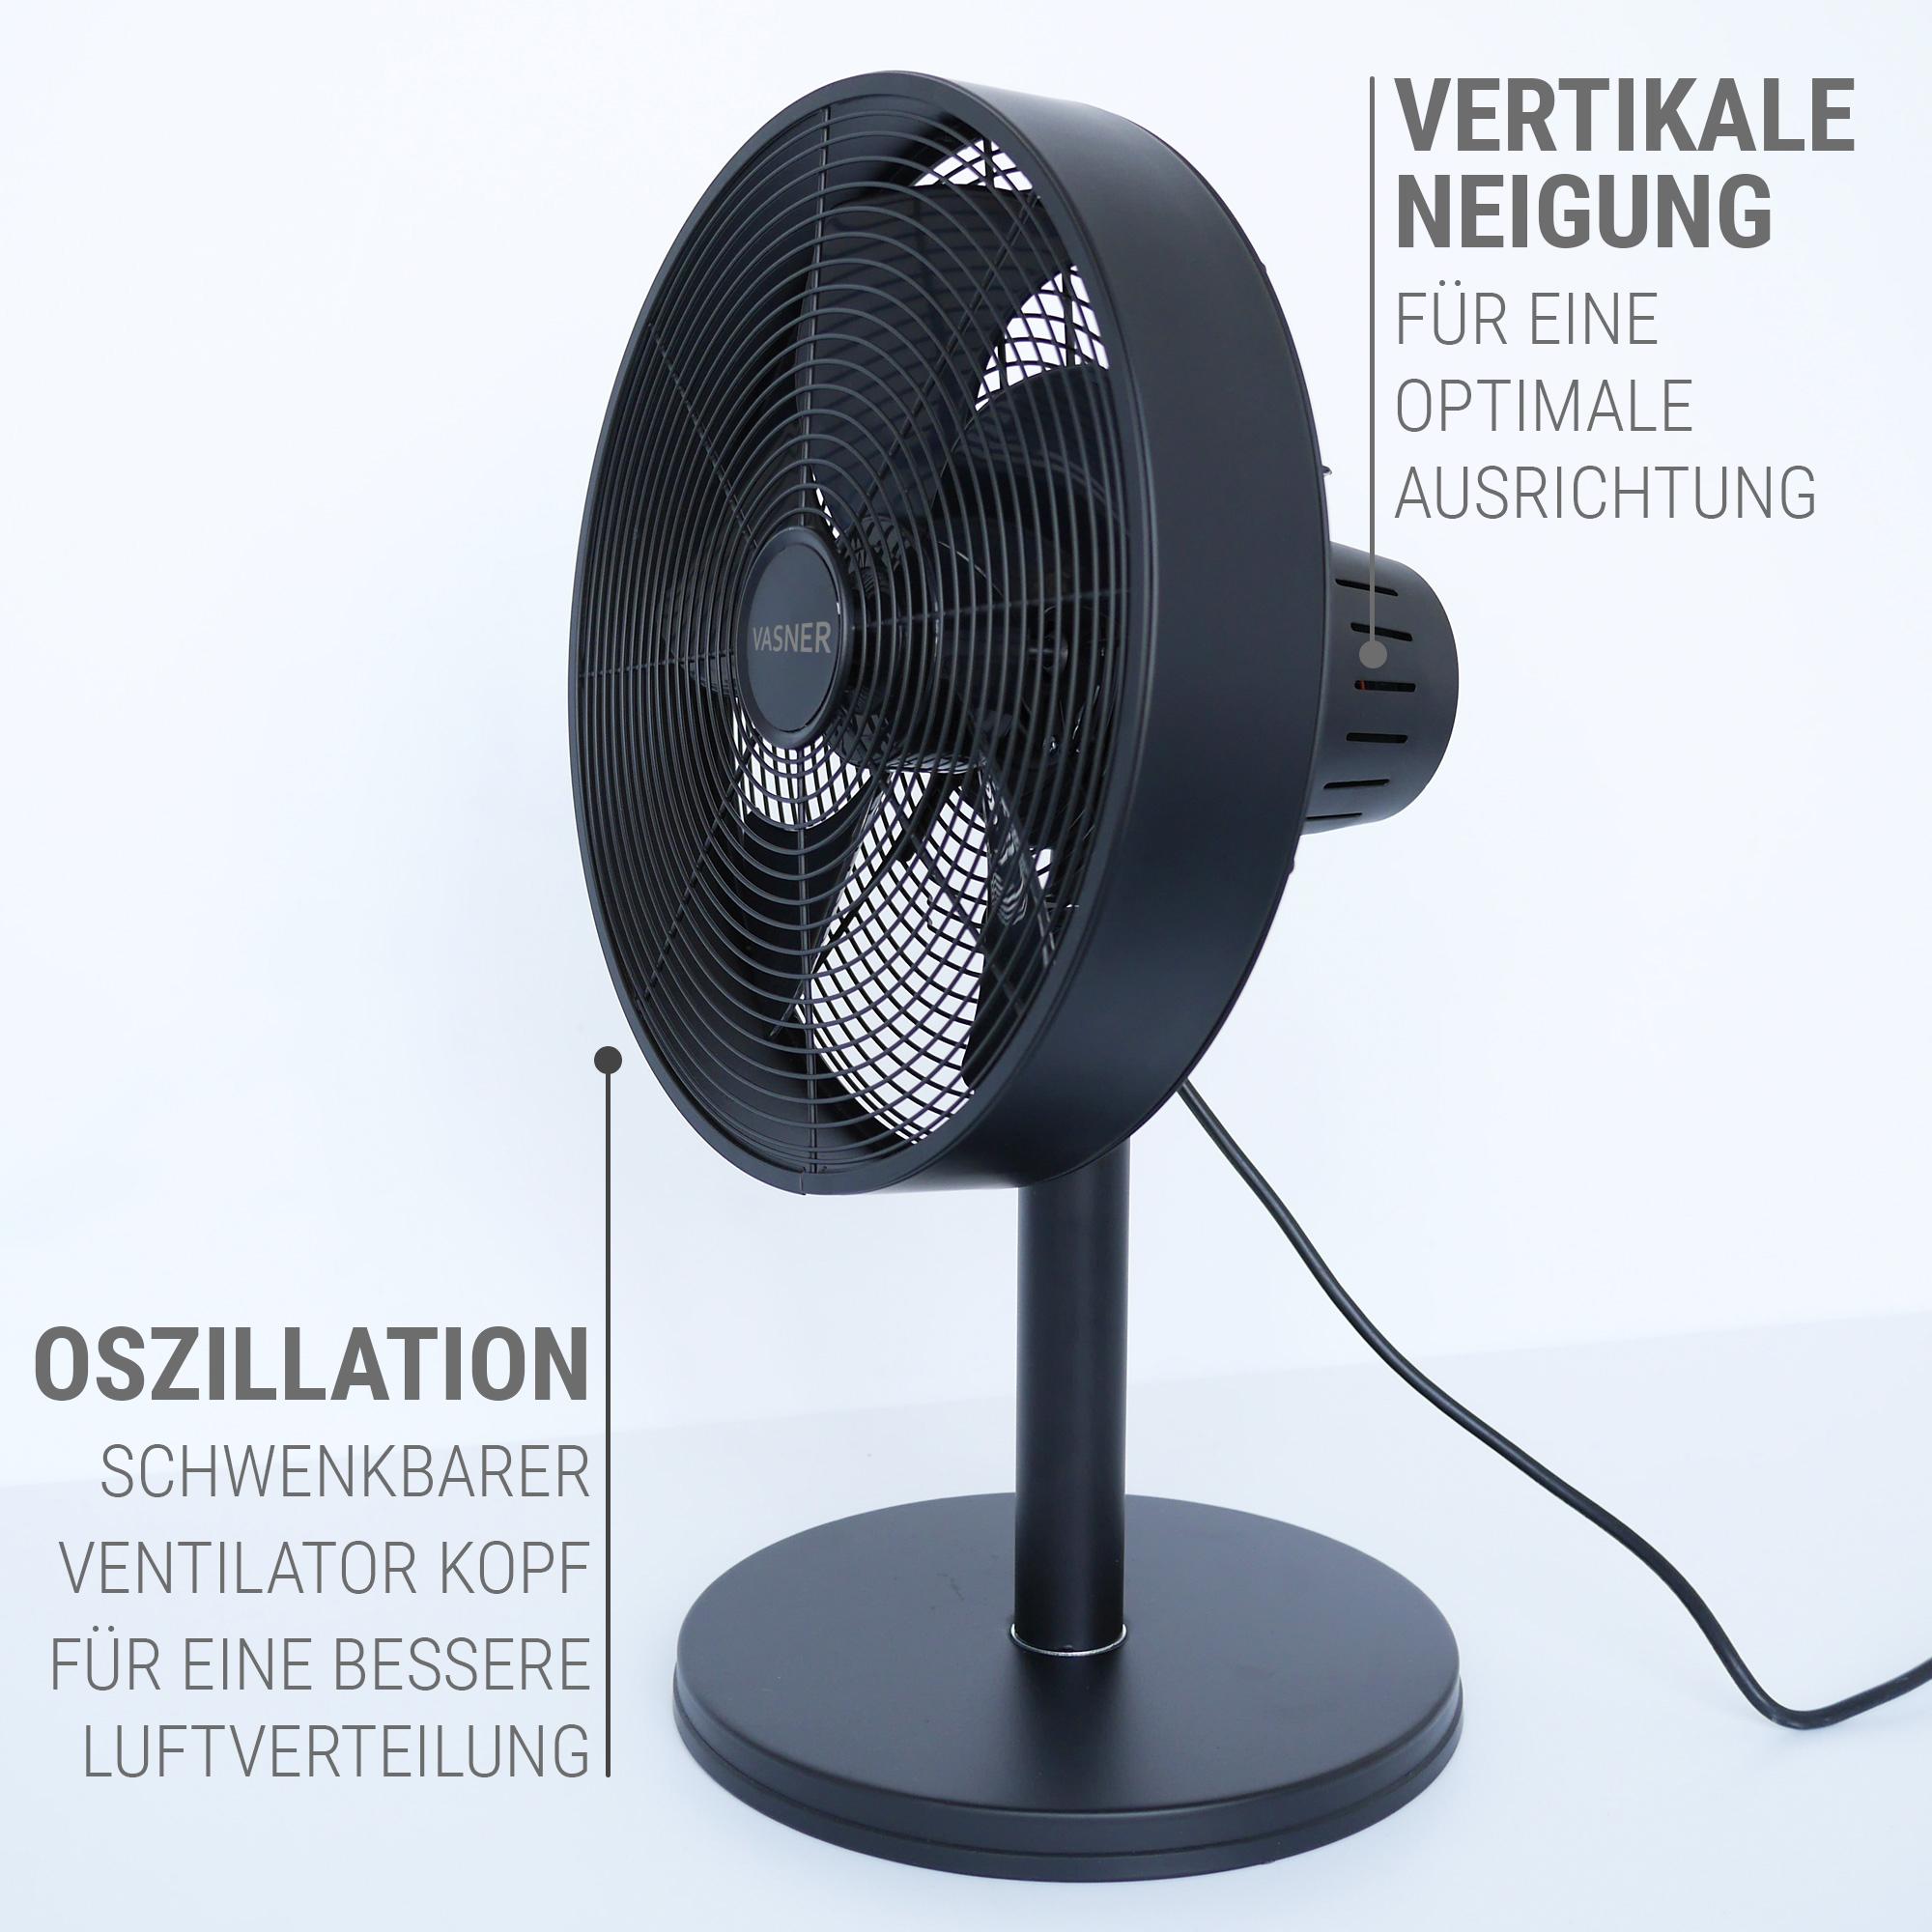 Tisch Ventilator leise, Kopf neigbar, oszillierend